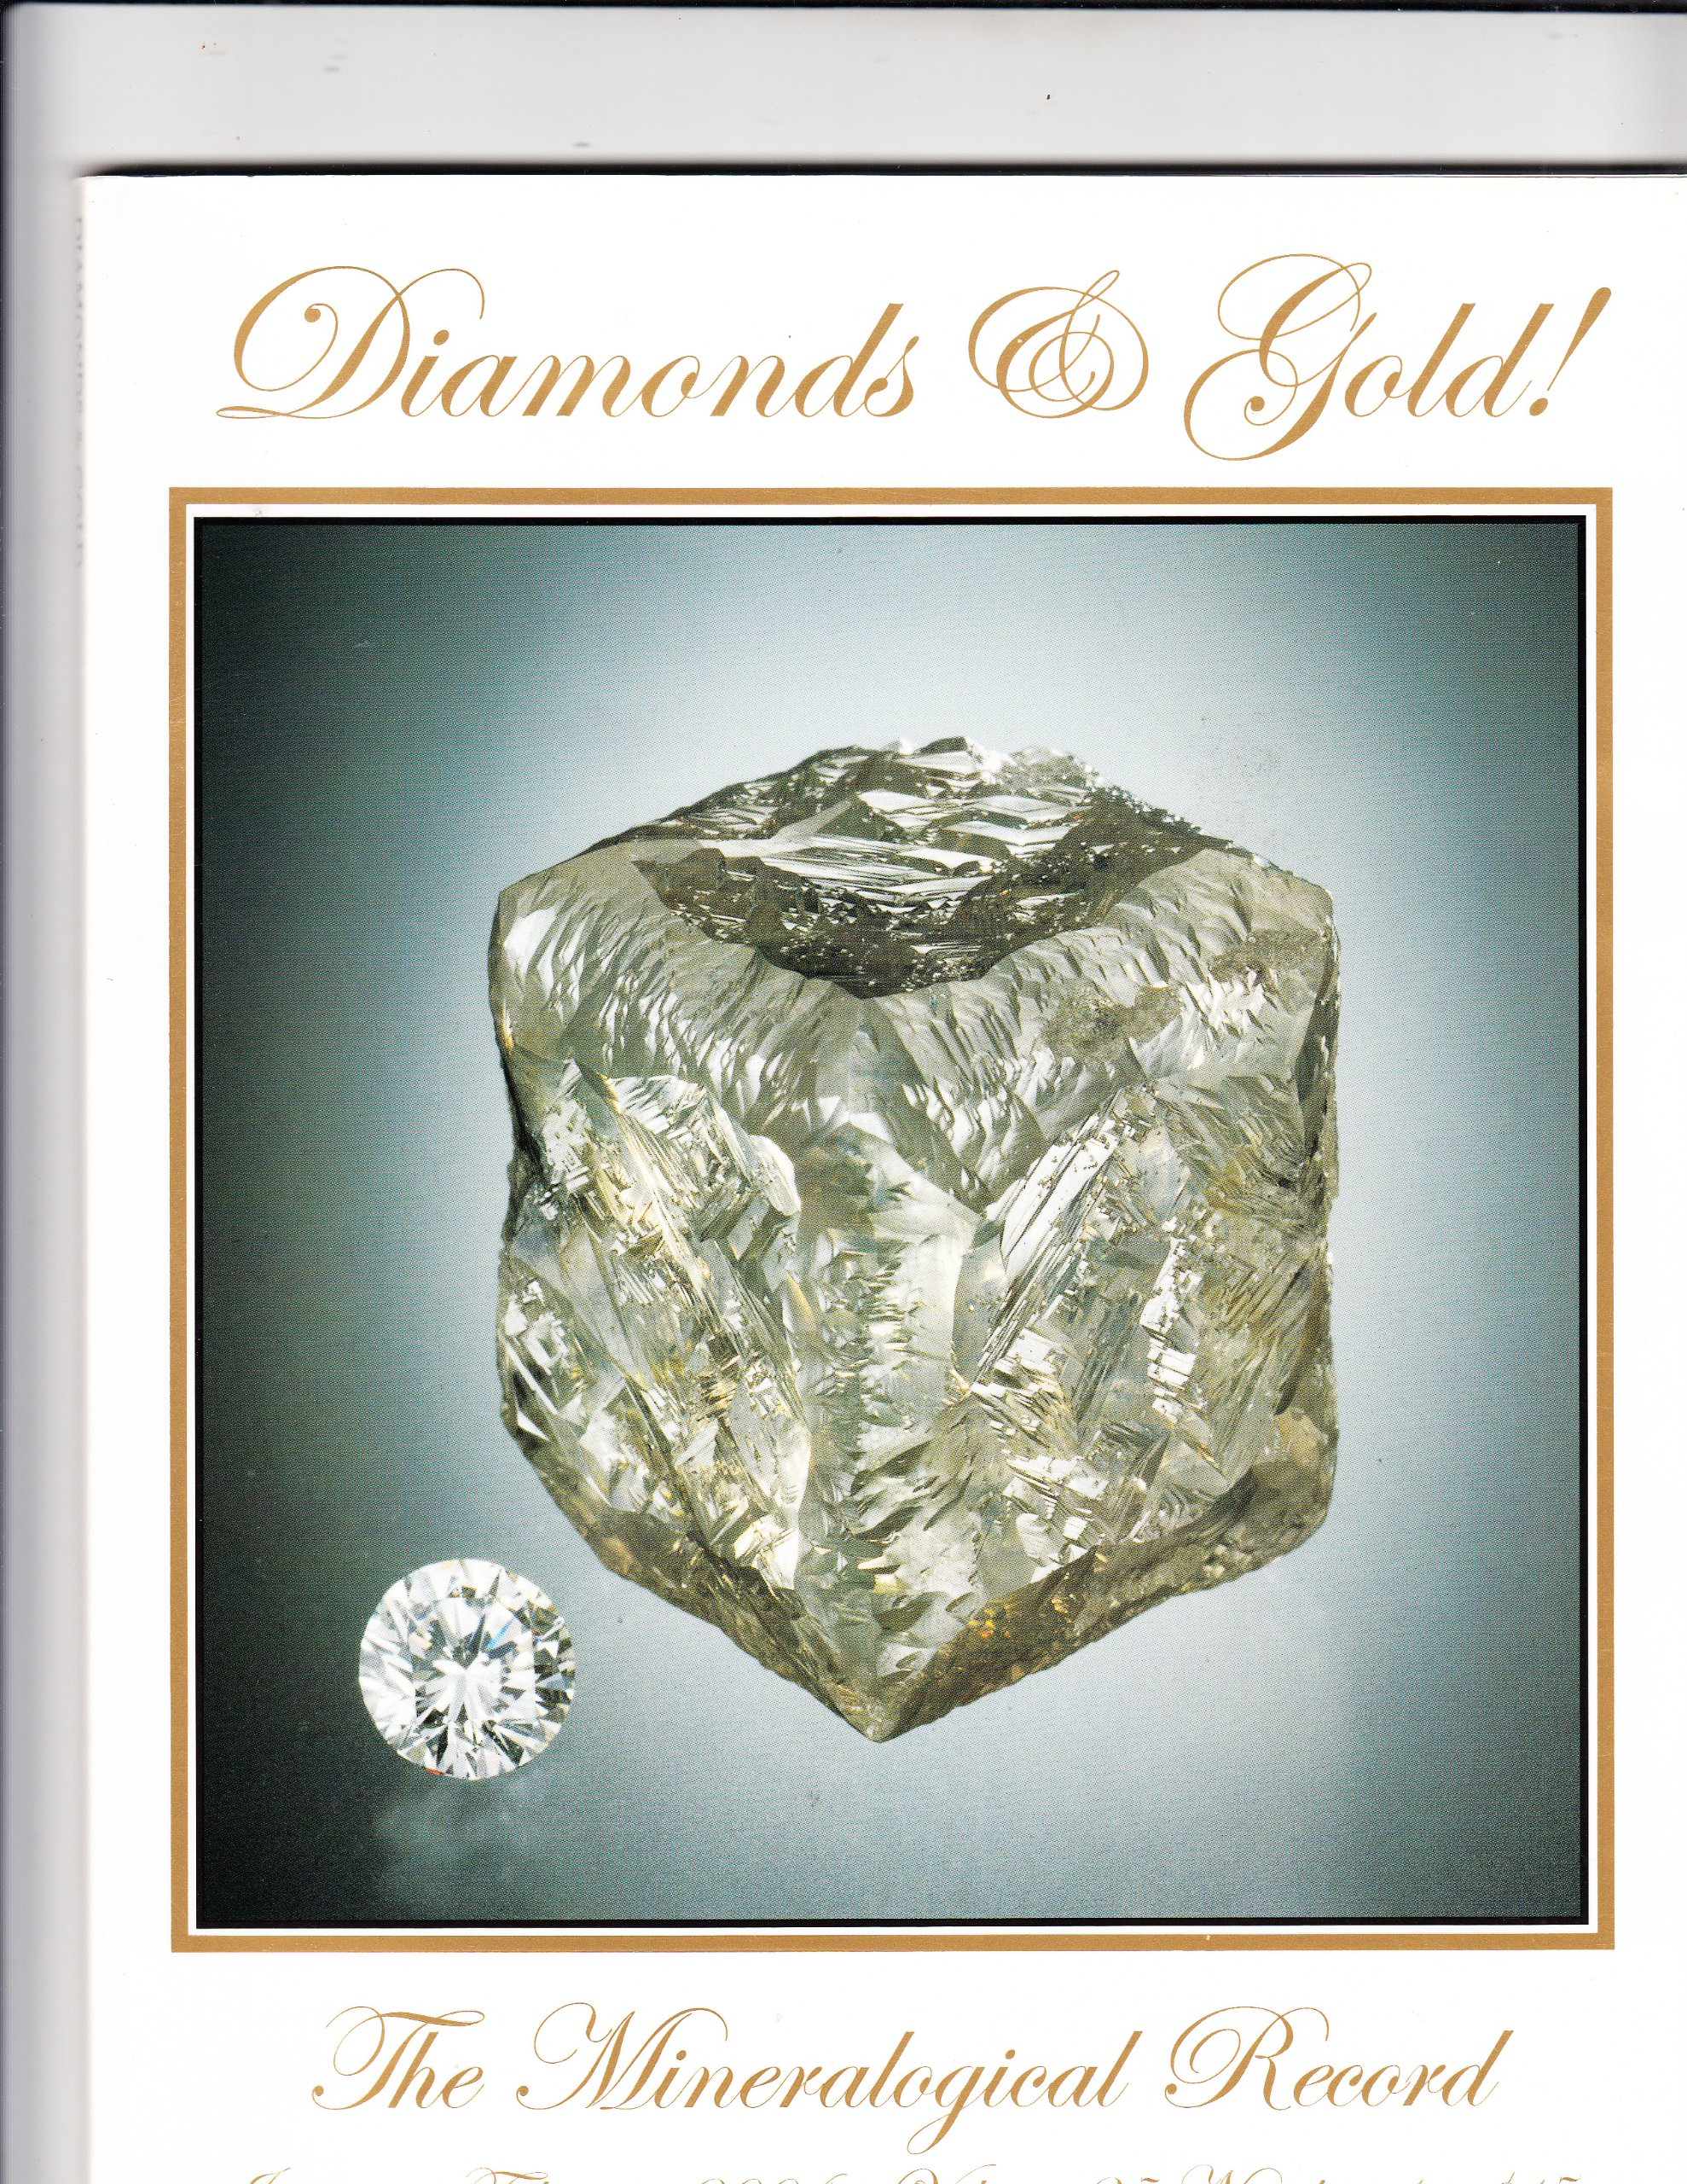 Download Diamonds & Gold! January-February 2004 (Mineralogical Record, Volume 35, Number 1) pdf epub